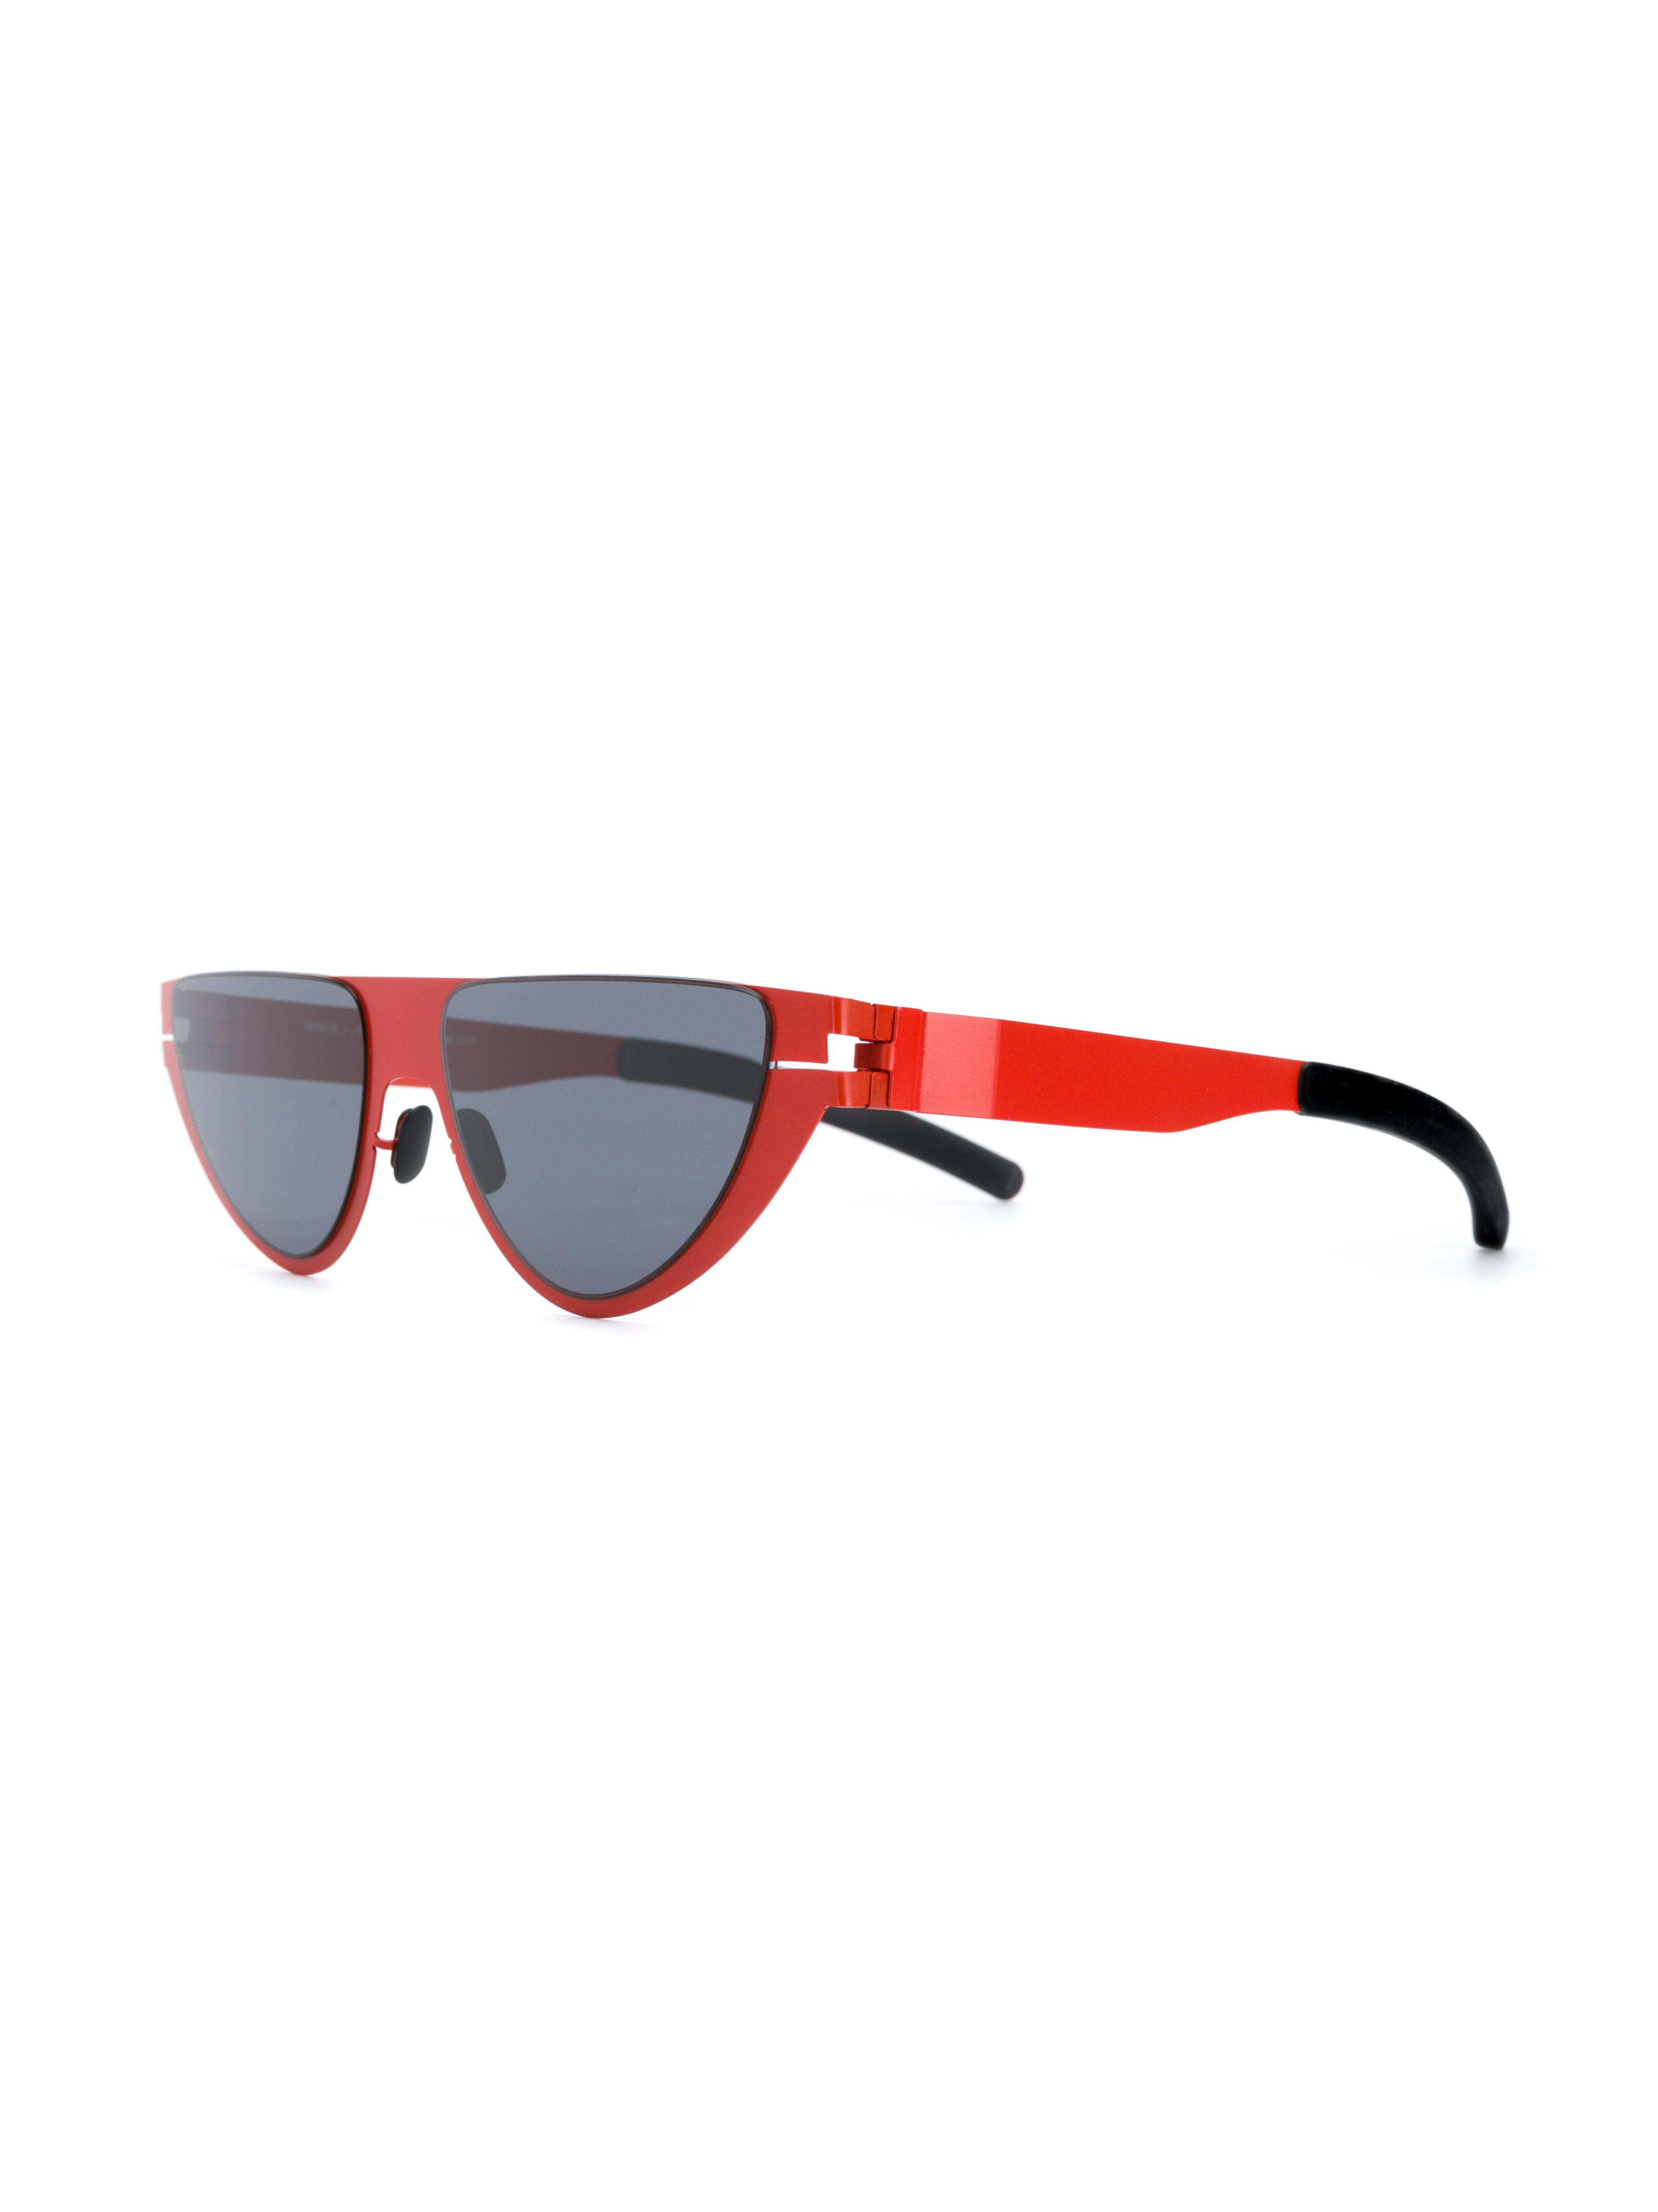 b31381846fc Mykita X Martine Rose Cat Eye Frame Sunglasses in Red - Save 47% - Lyst